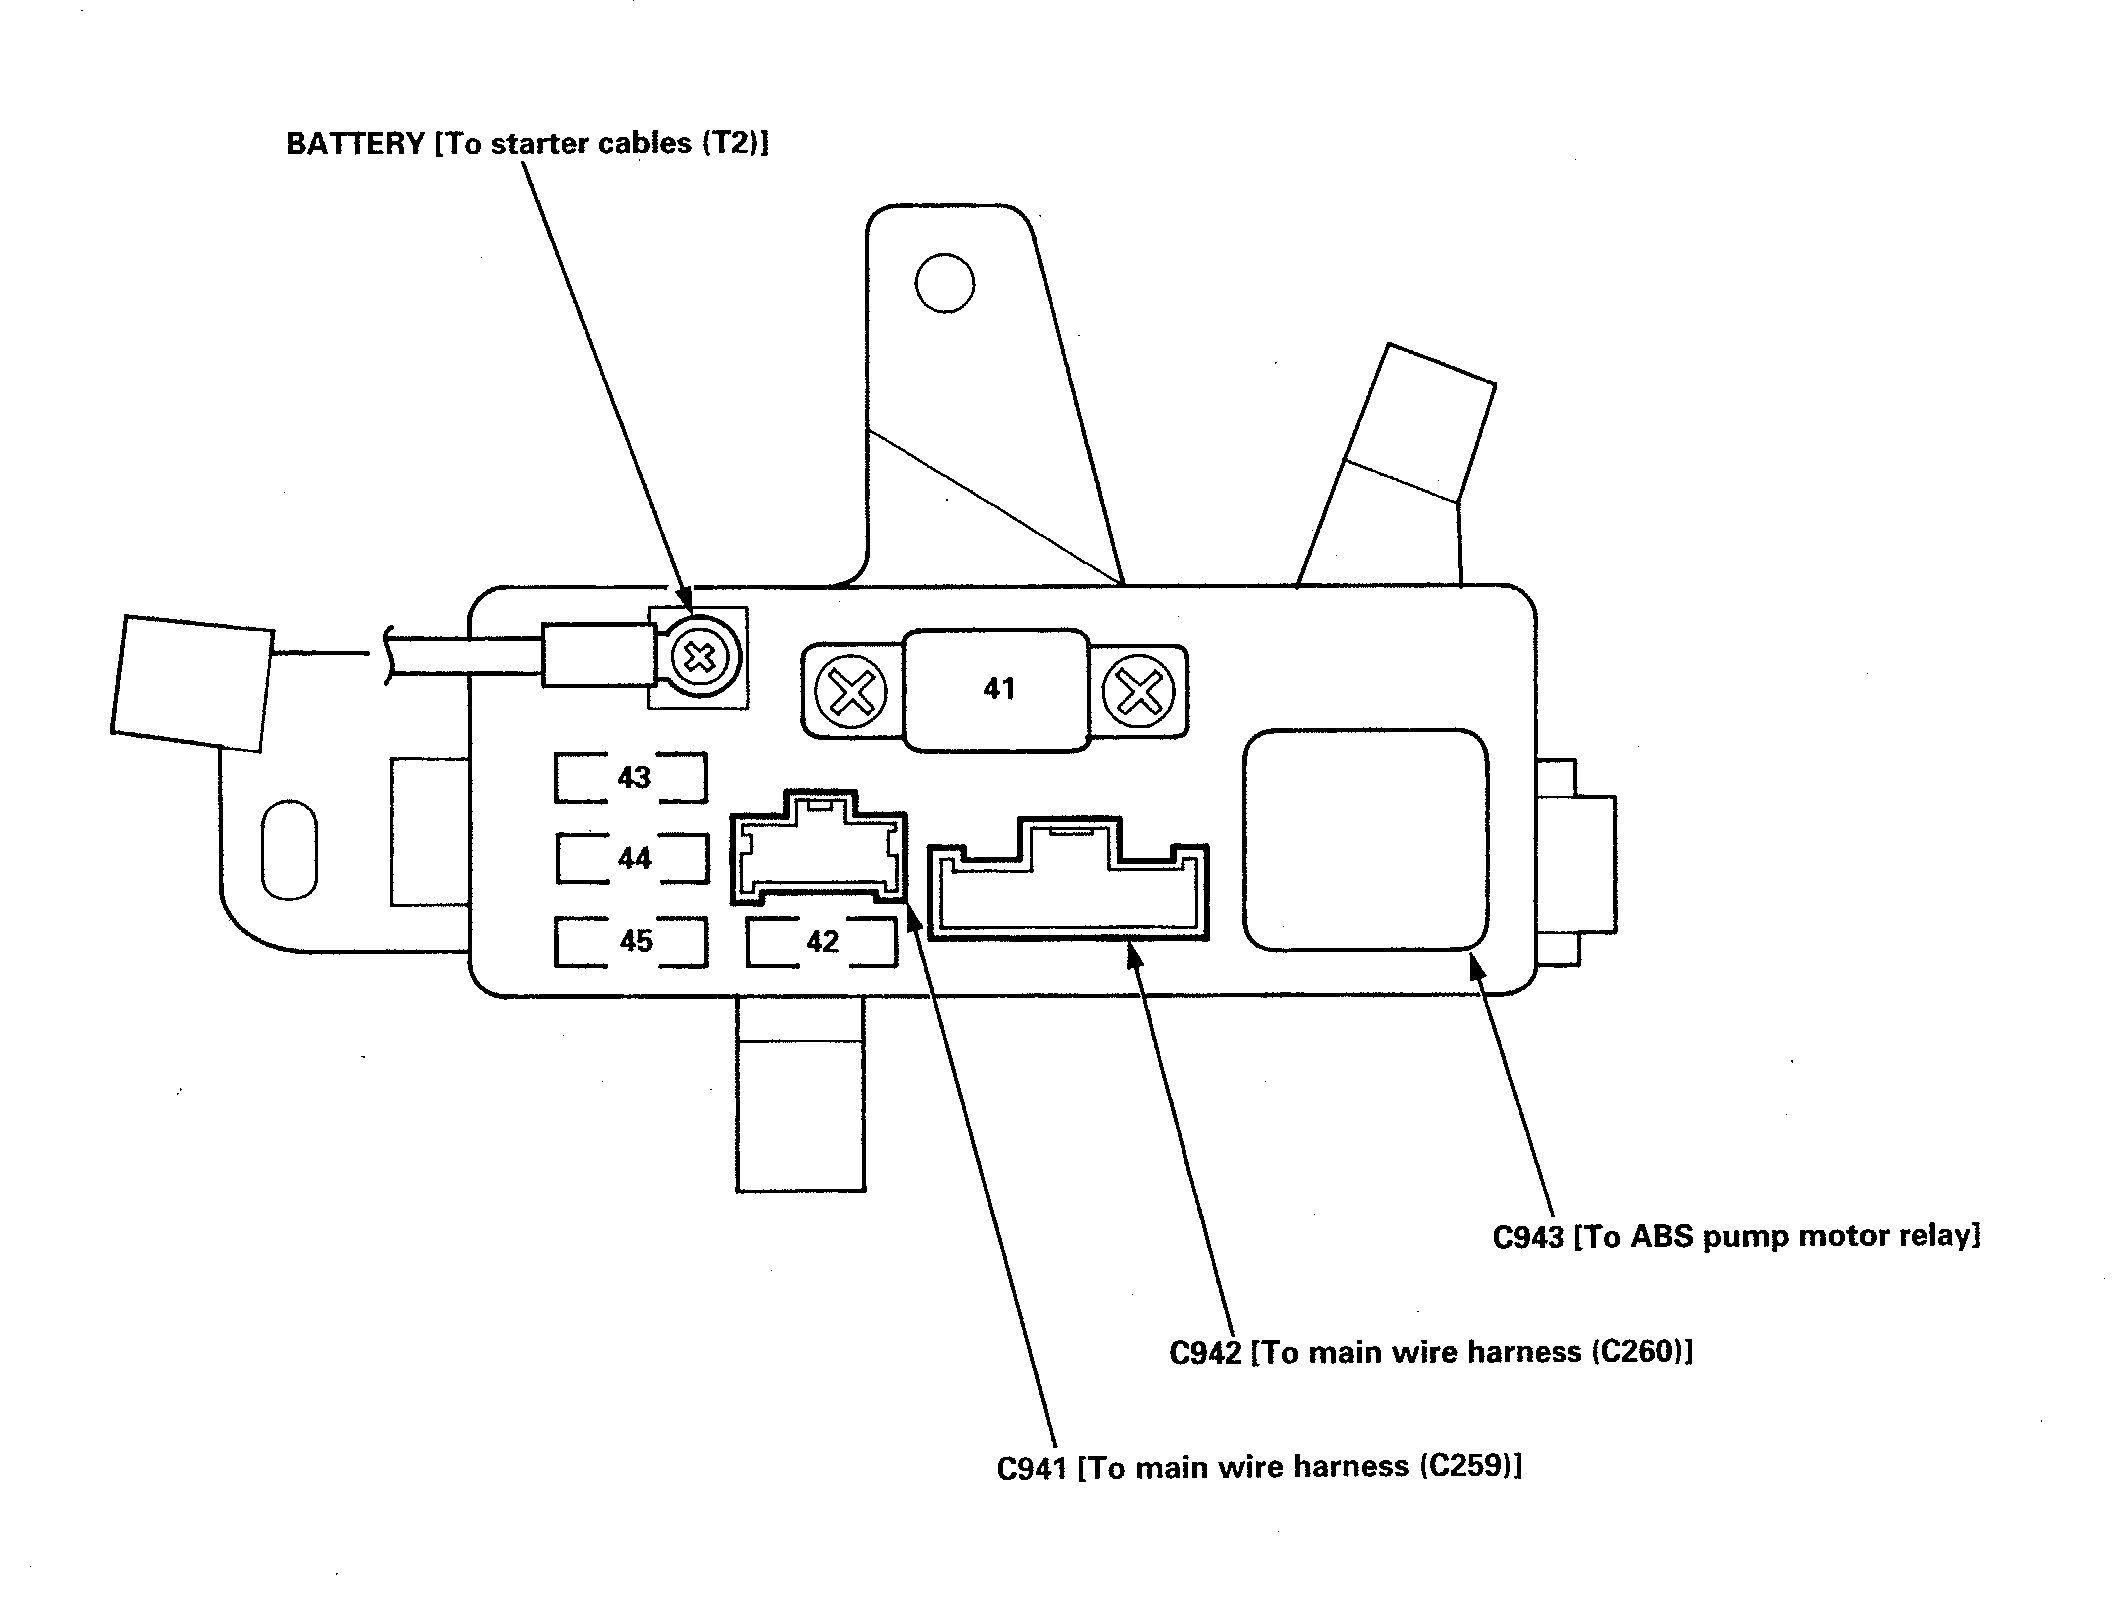 Wiring Scimatic 20001lincoln Ls Diagram] 91 isuzu Npr Fuse Diagram Full Version Hd Quality Of Wiring Scimatic 20001lincoln Ls